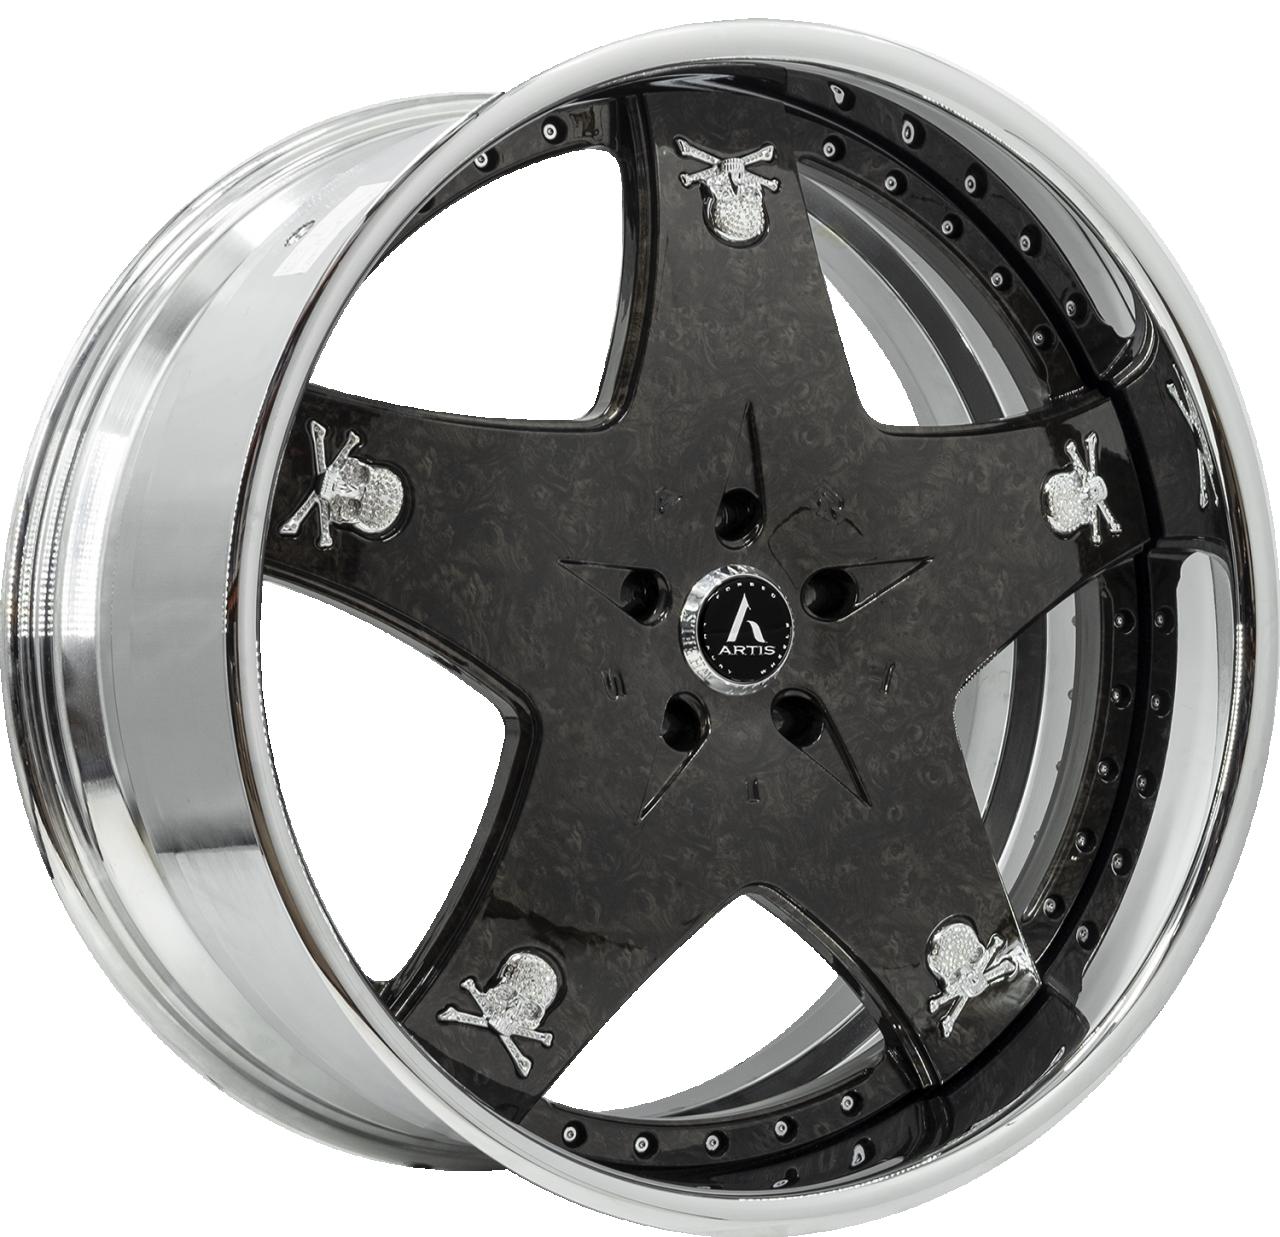 Artis Forged Cashville wheel with Black Burlwood finish